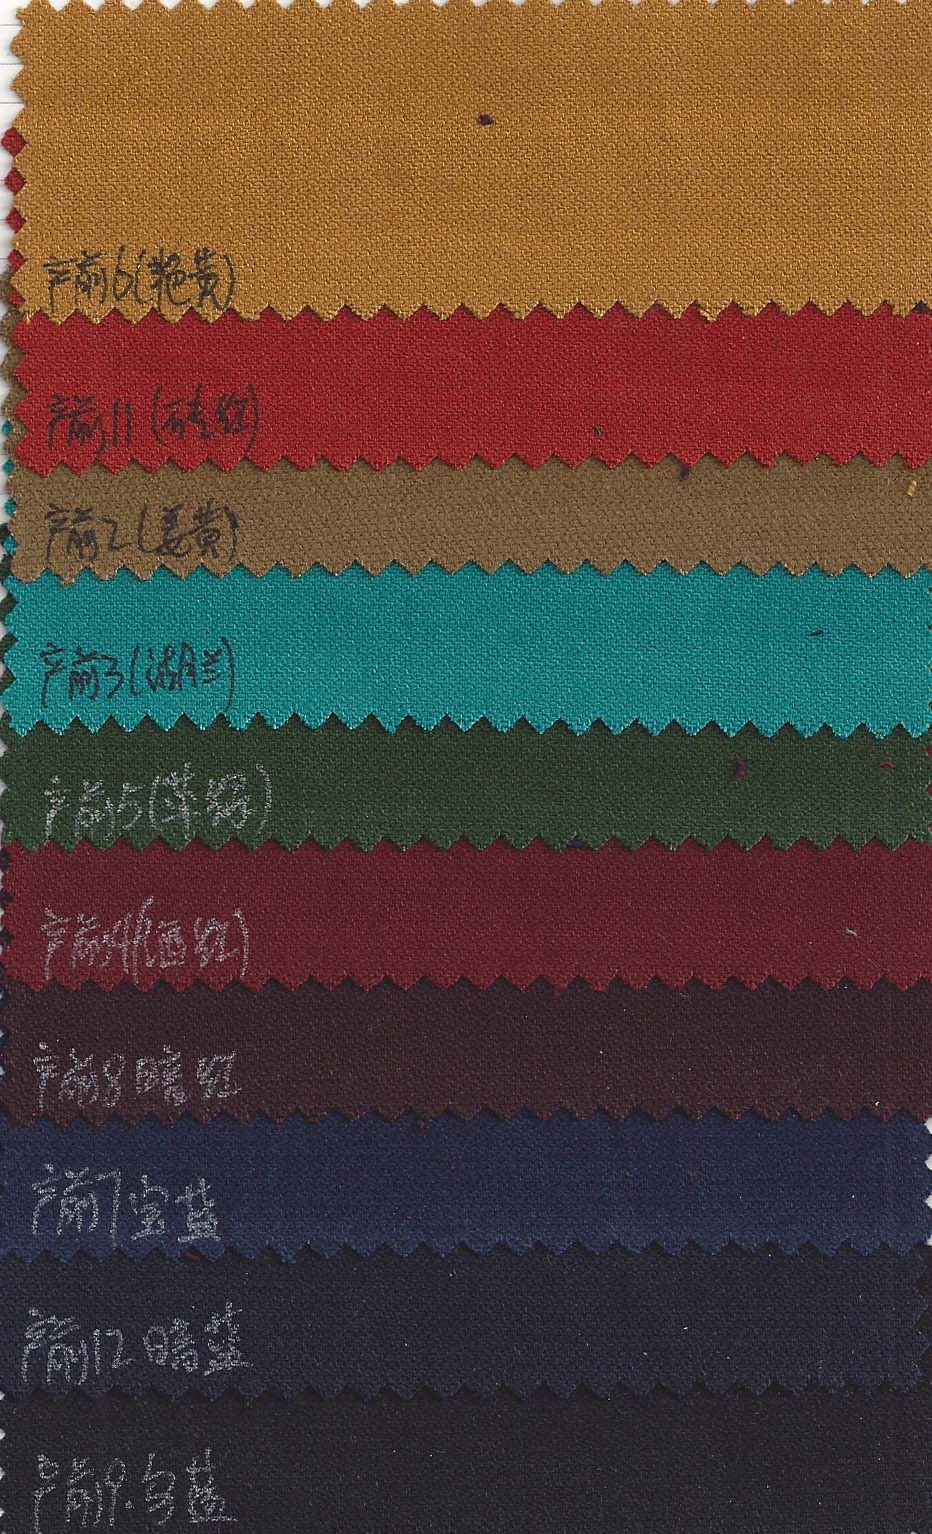 Since 1981 TL013.jpg